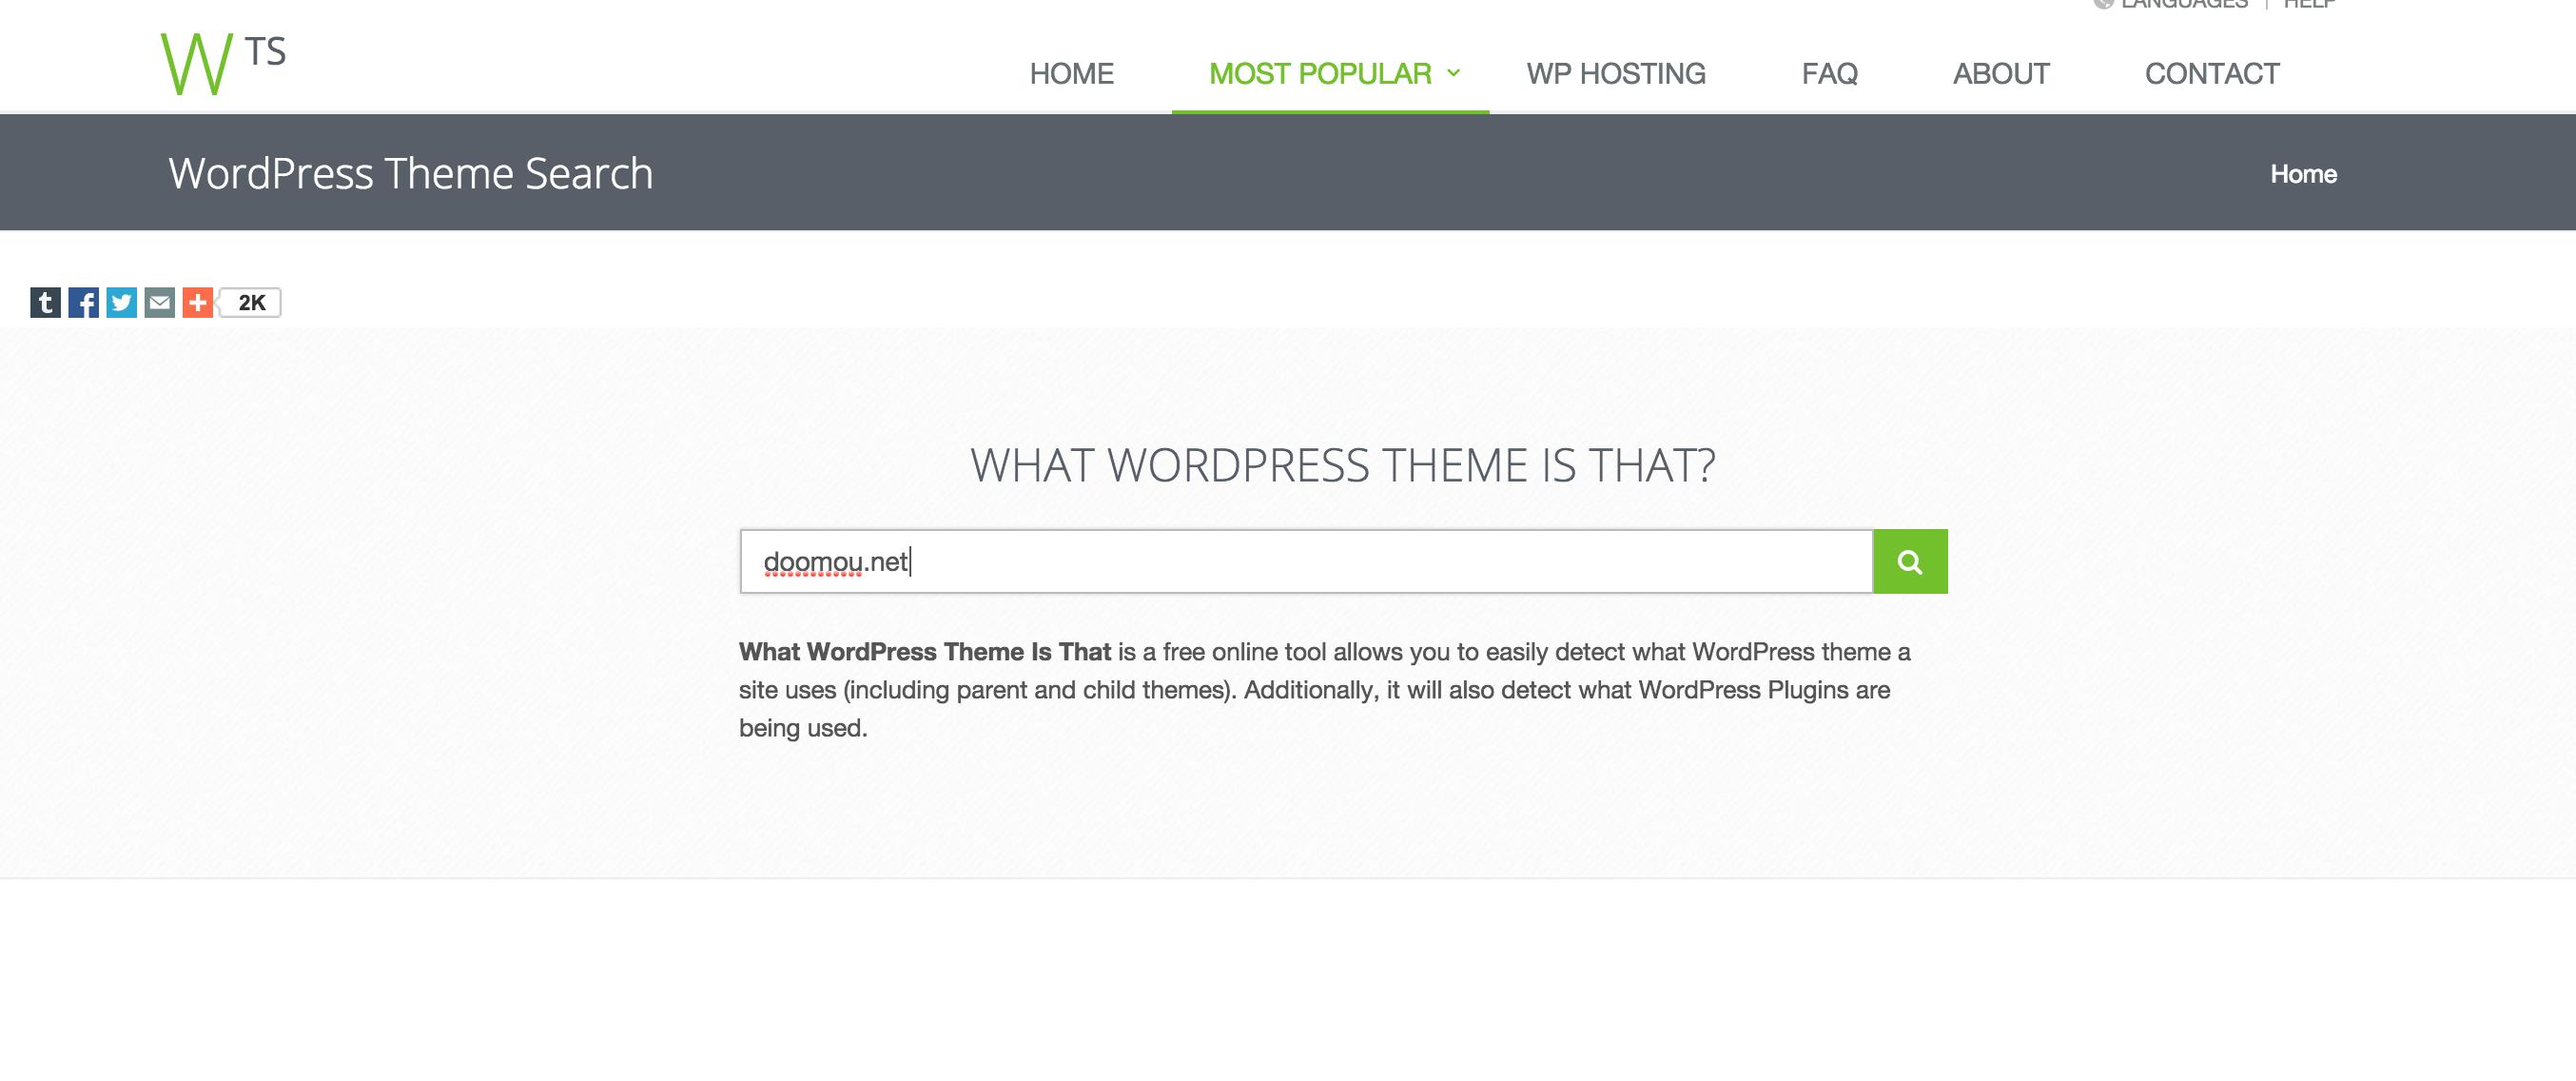 WordPressで作られたサイトのテーマやプラグインを簡単に調べる方法とは?